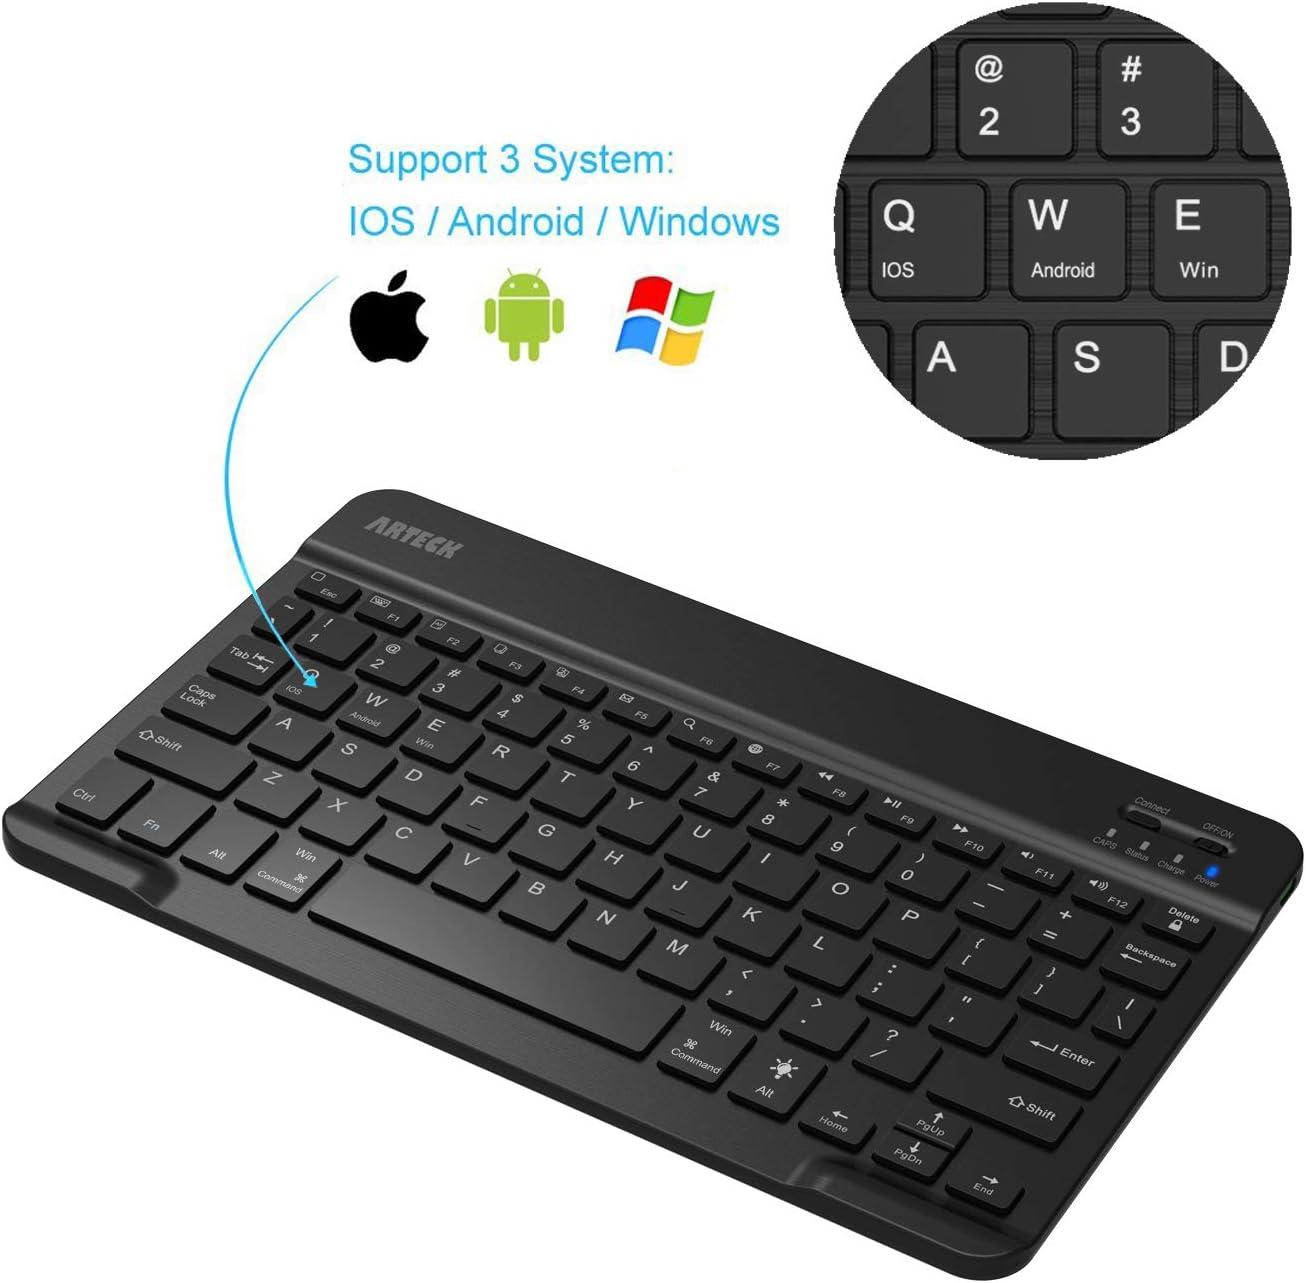 Arteck Universal Backlit 7-Colors & Adjustable Brightness Ultra Light & Slim Portable Wireless Bluetooth 3.0 Keyboard for iOS iPad Air, iPad Mini, ...